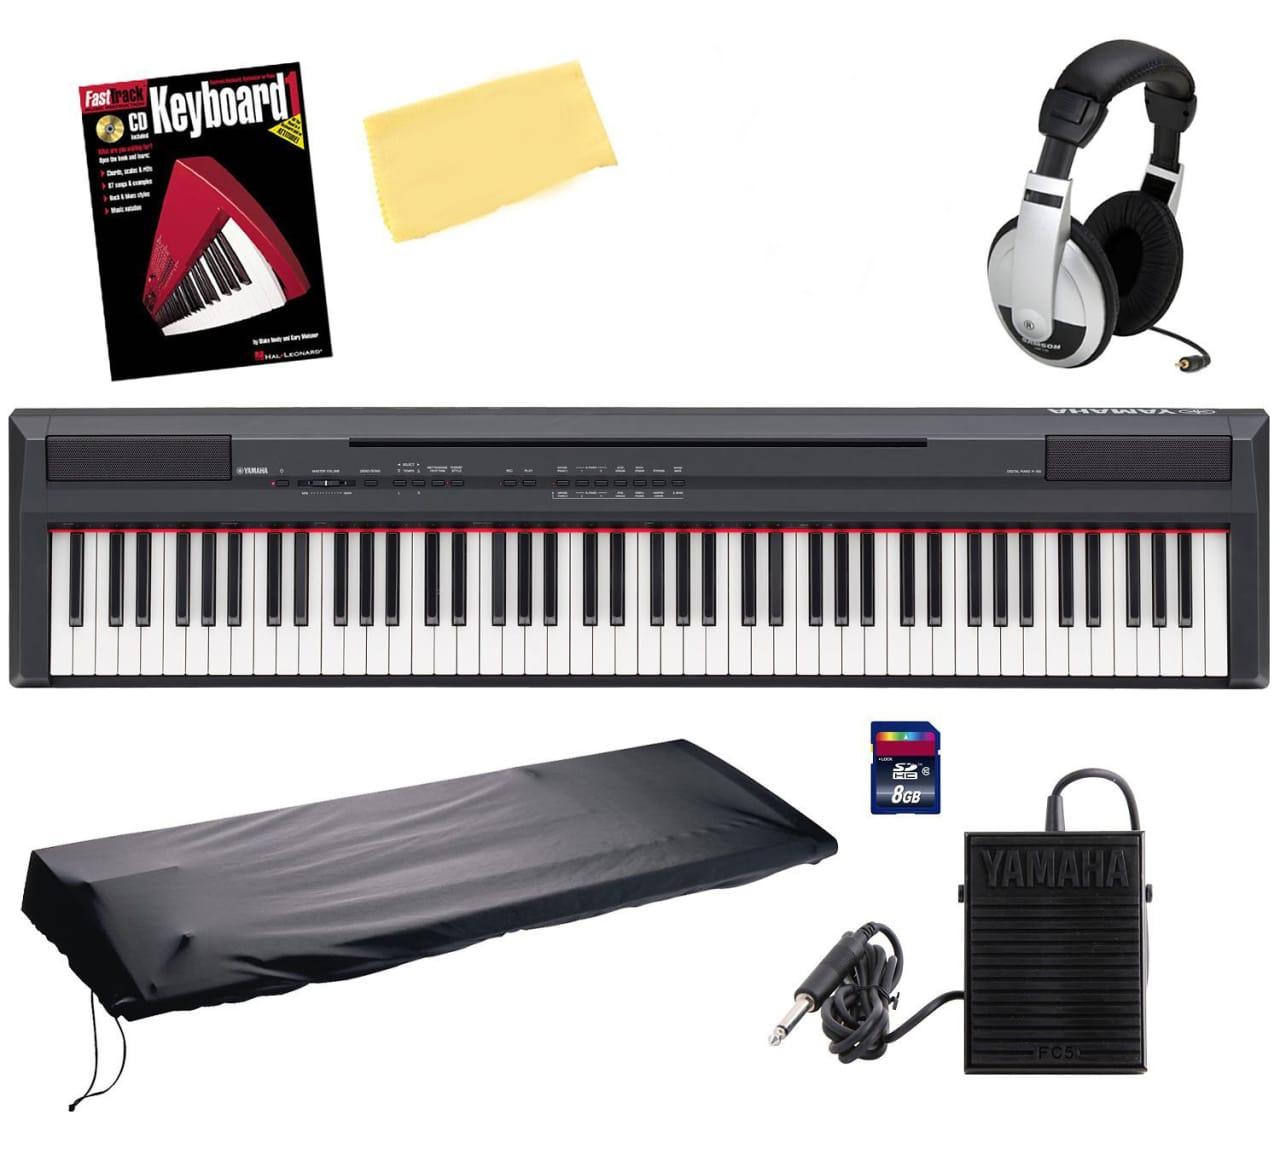 Yamaha p105b 88 key digital piano bundle with 8gb sd card for Yamaha p105 digital piano bundle